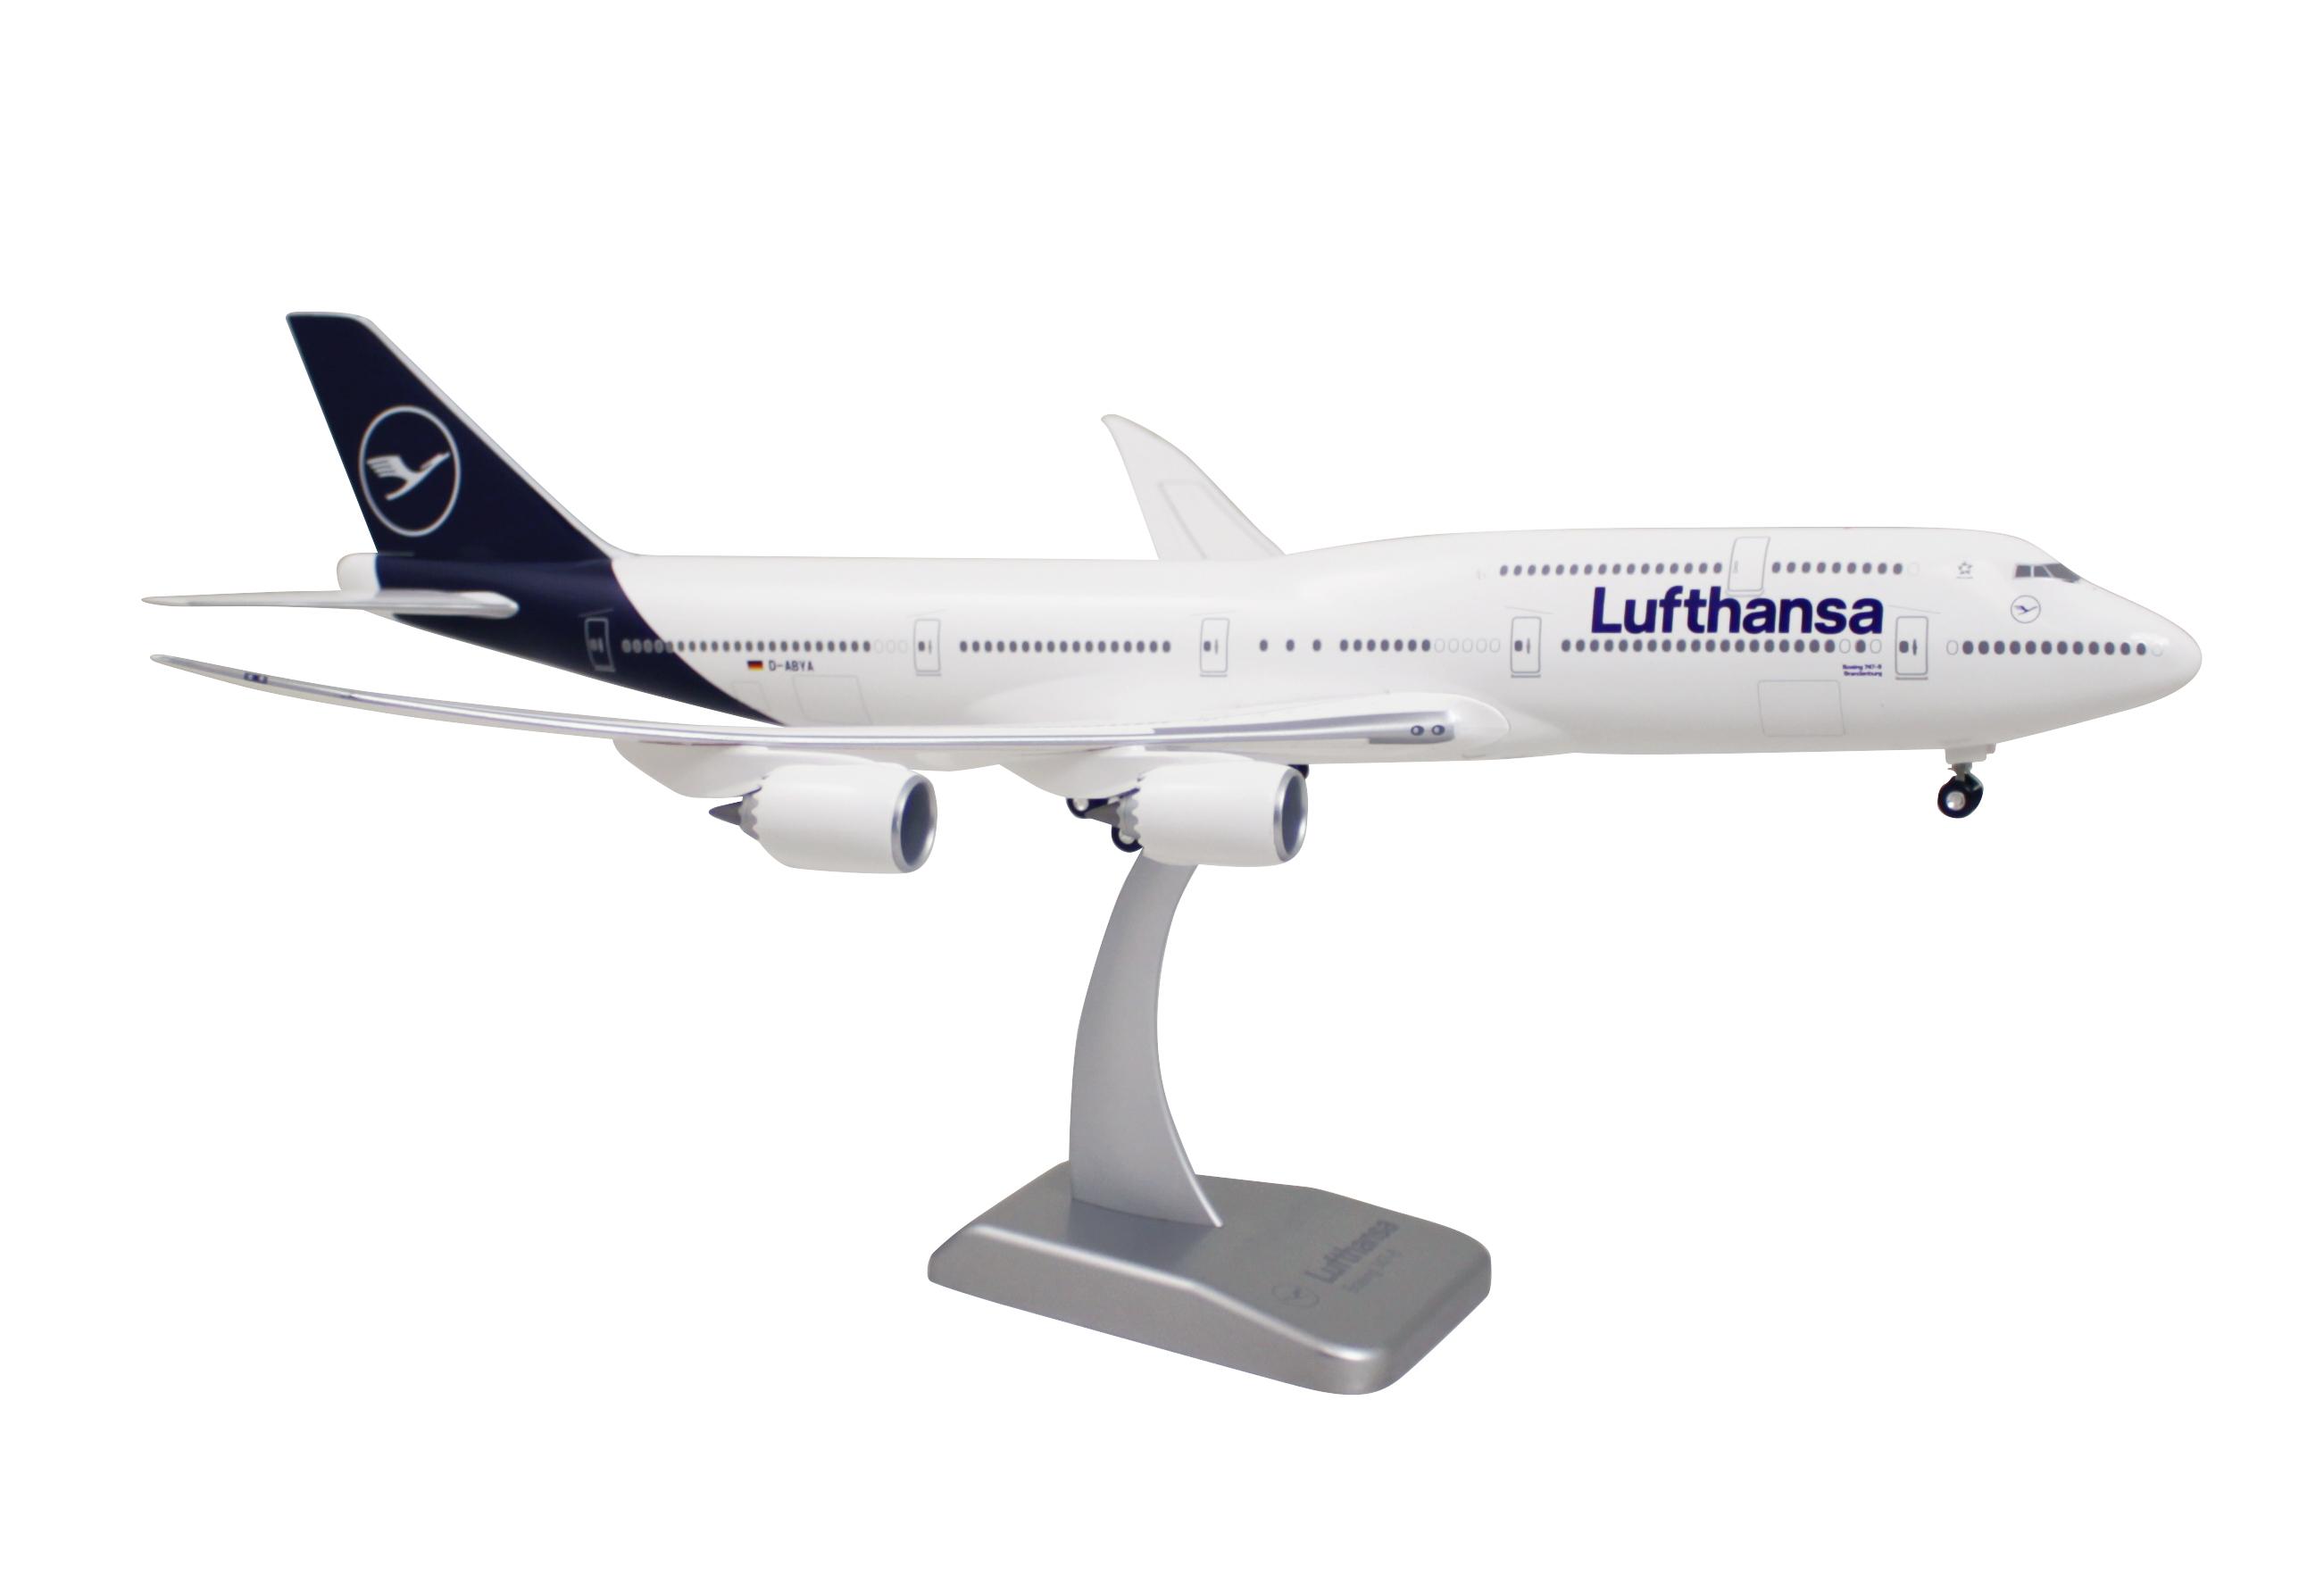 Limox - Lufthansa Boeing 747-8 New Livery 1:200